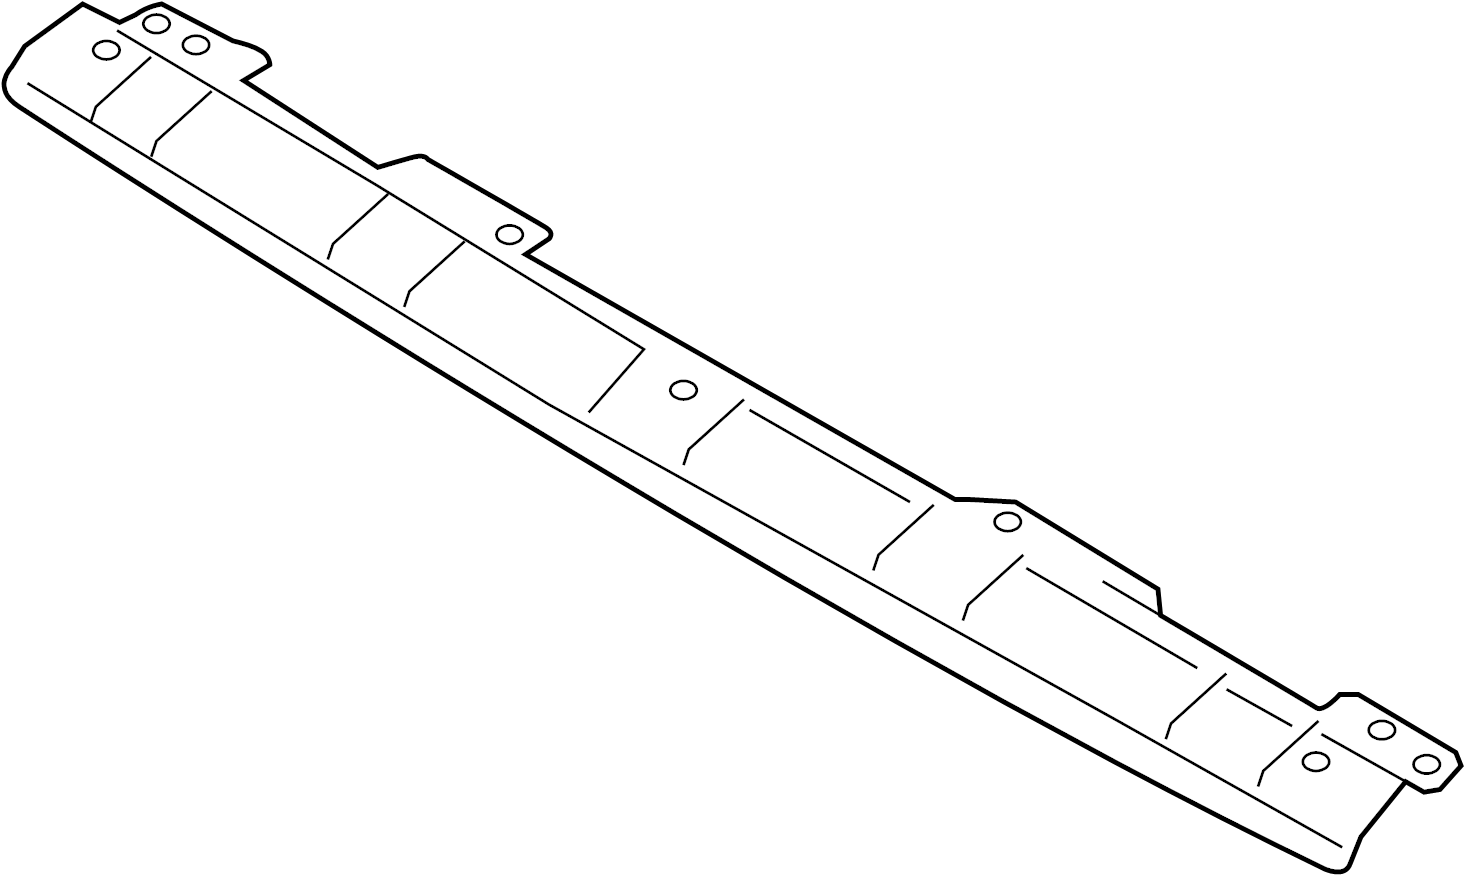 Audi S5 Roof Frame Cross Memb Header Ftop